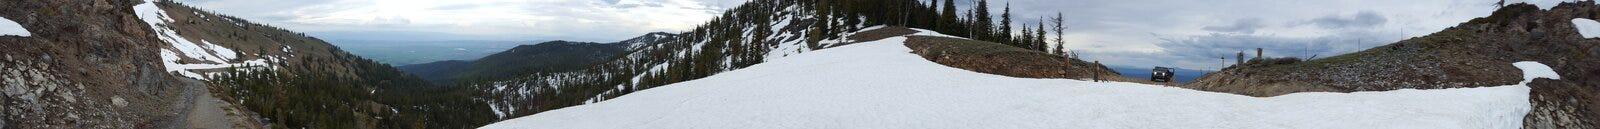 Marble Creek Summit royalty free stock photo